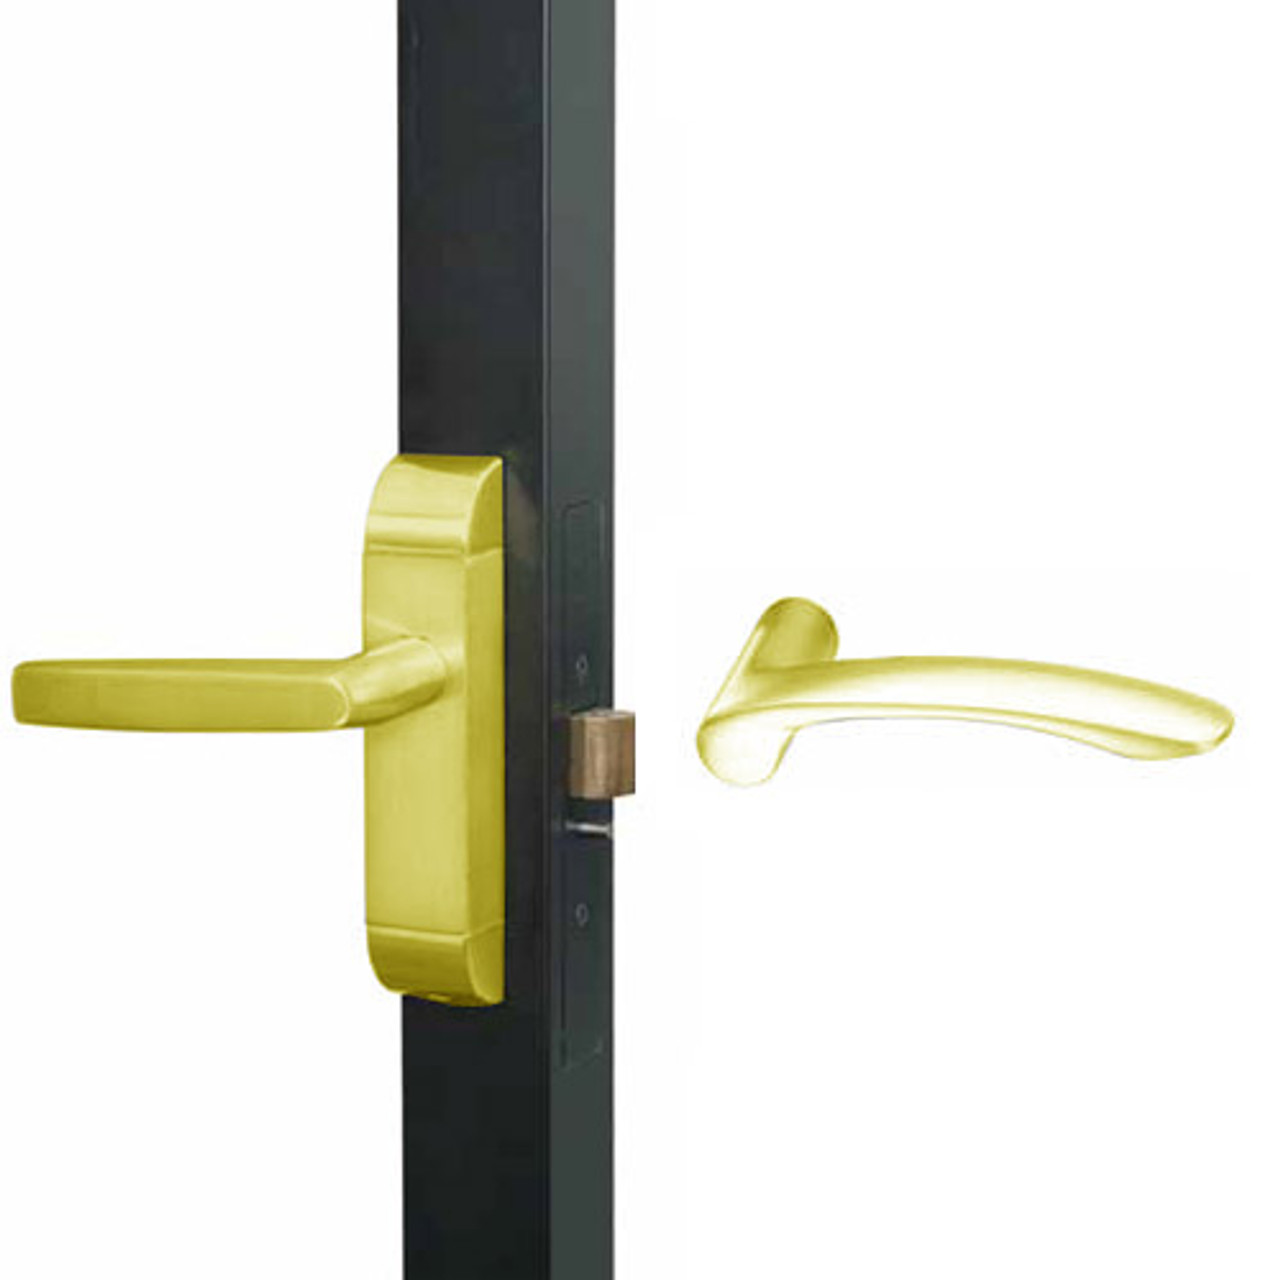 4600-MV-642-US3 Adams Rite MV Designer Deadlatch handle in Bright Brass Finish